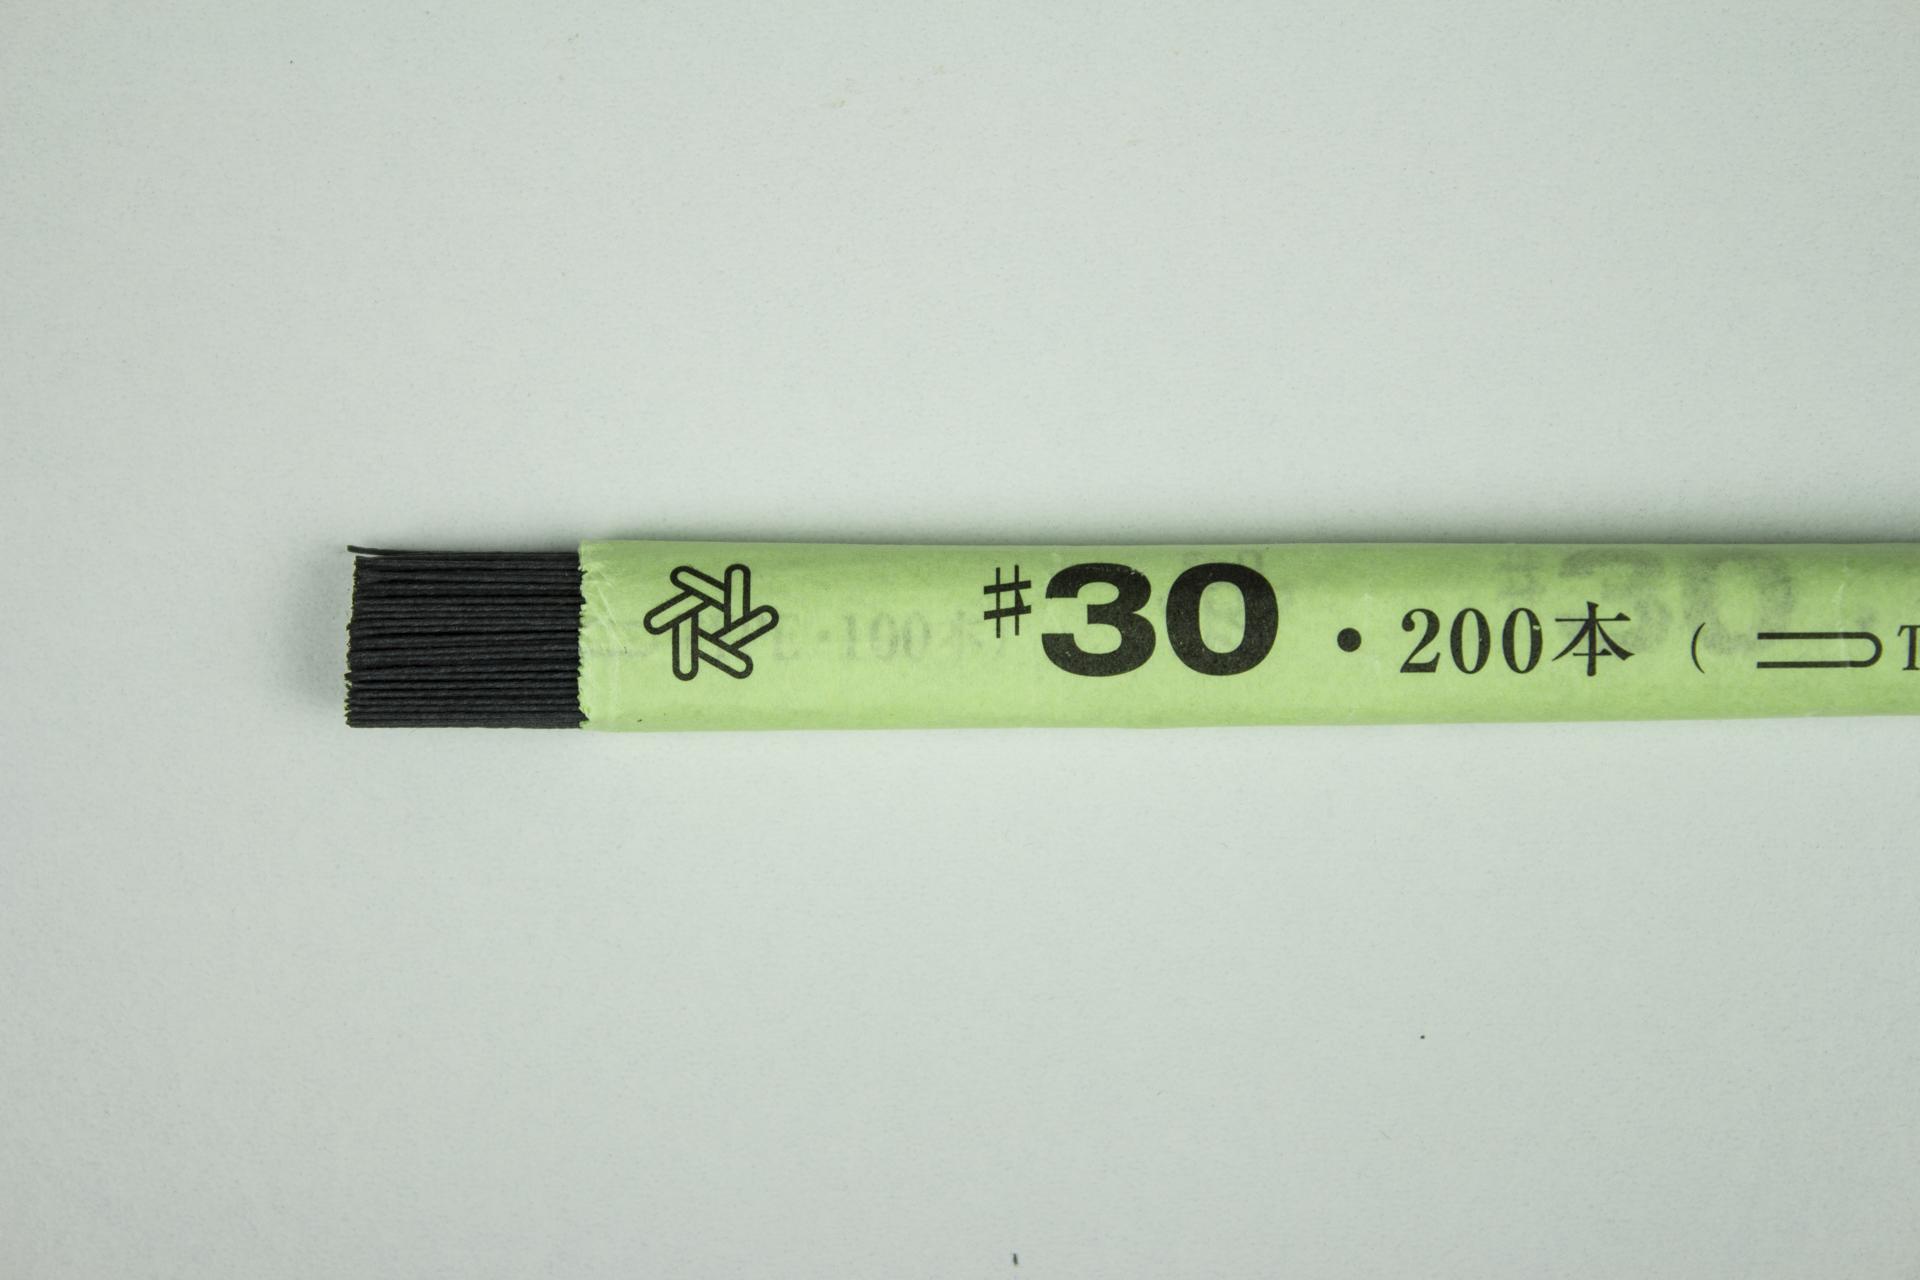 S36RW30BK